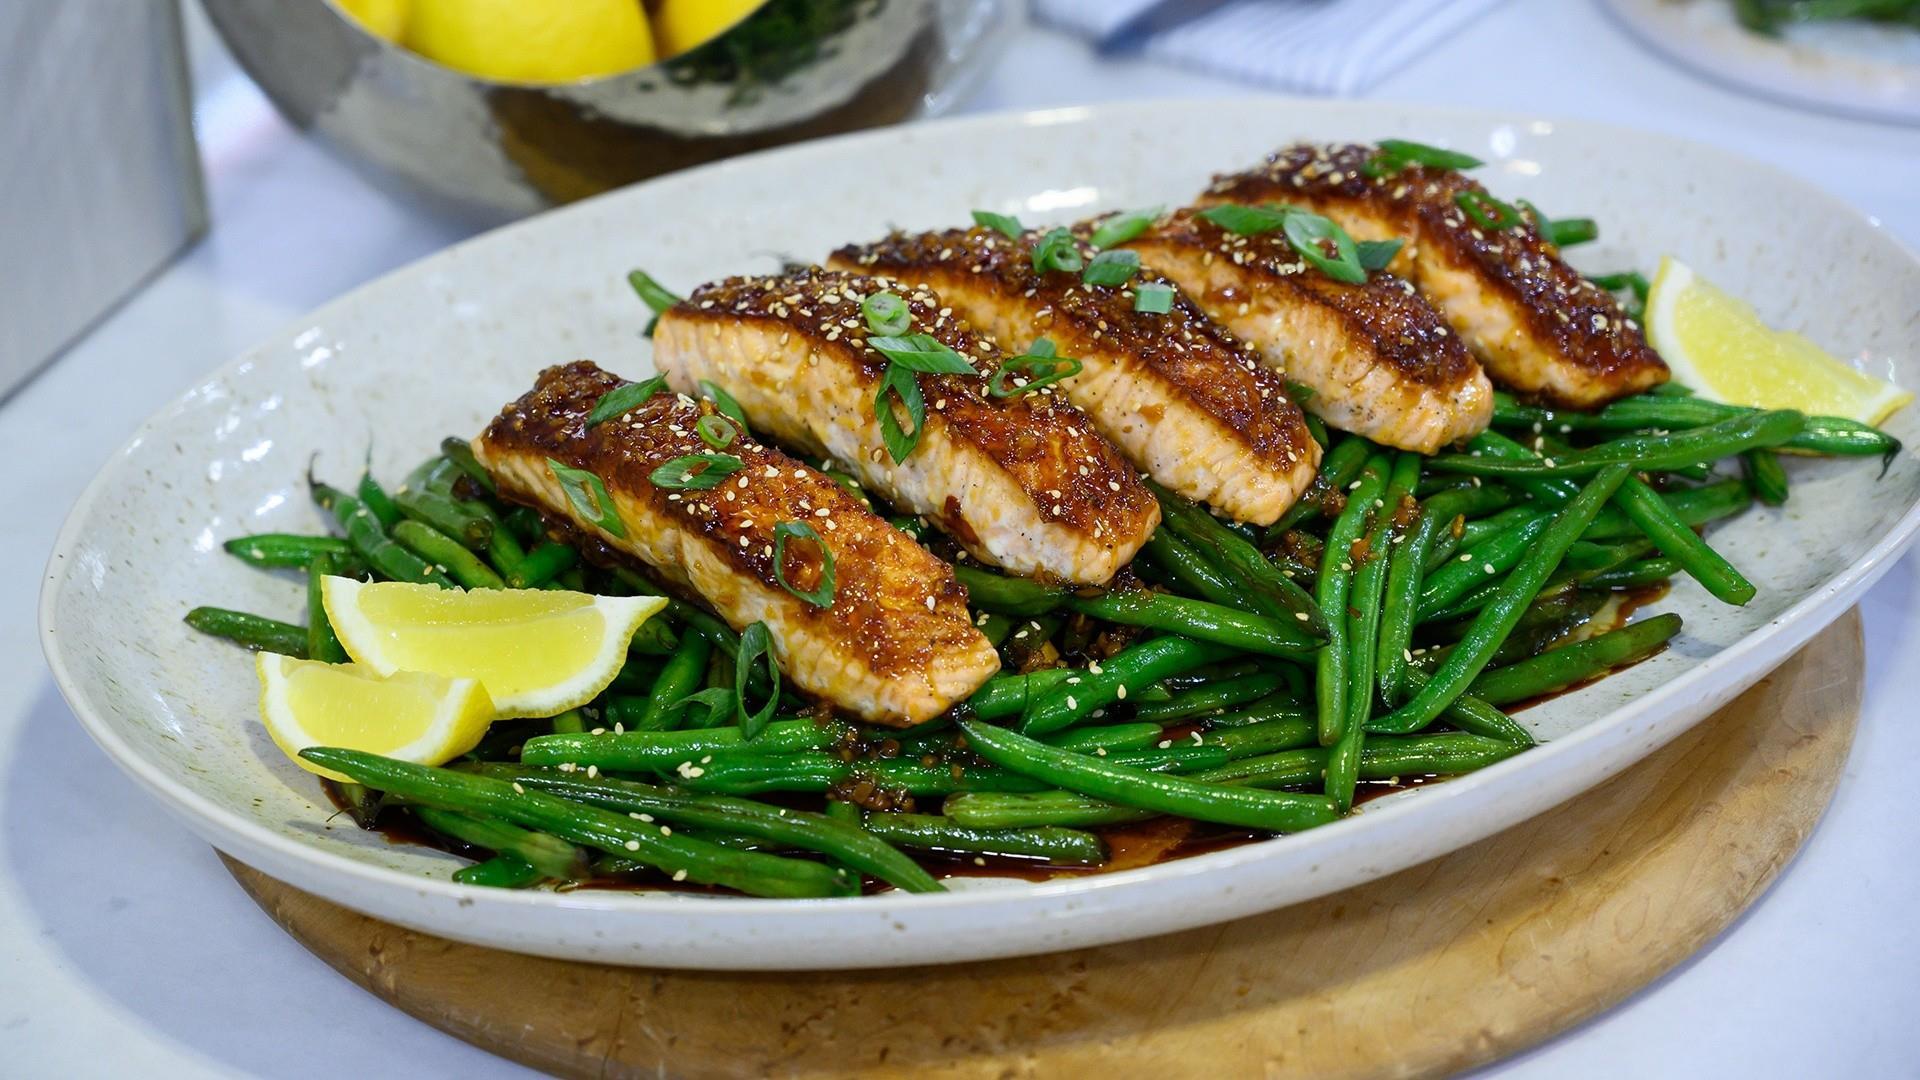 Weeknight dinner recipe: Make Jernard Wells' honey salmon